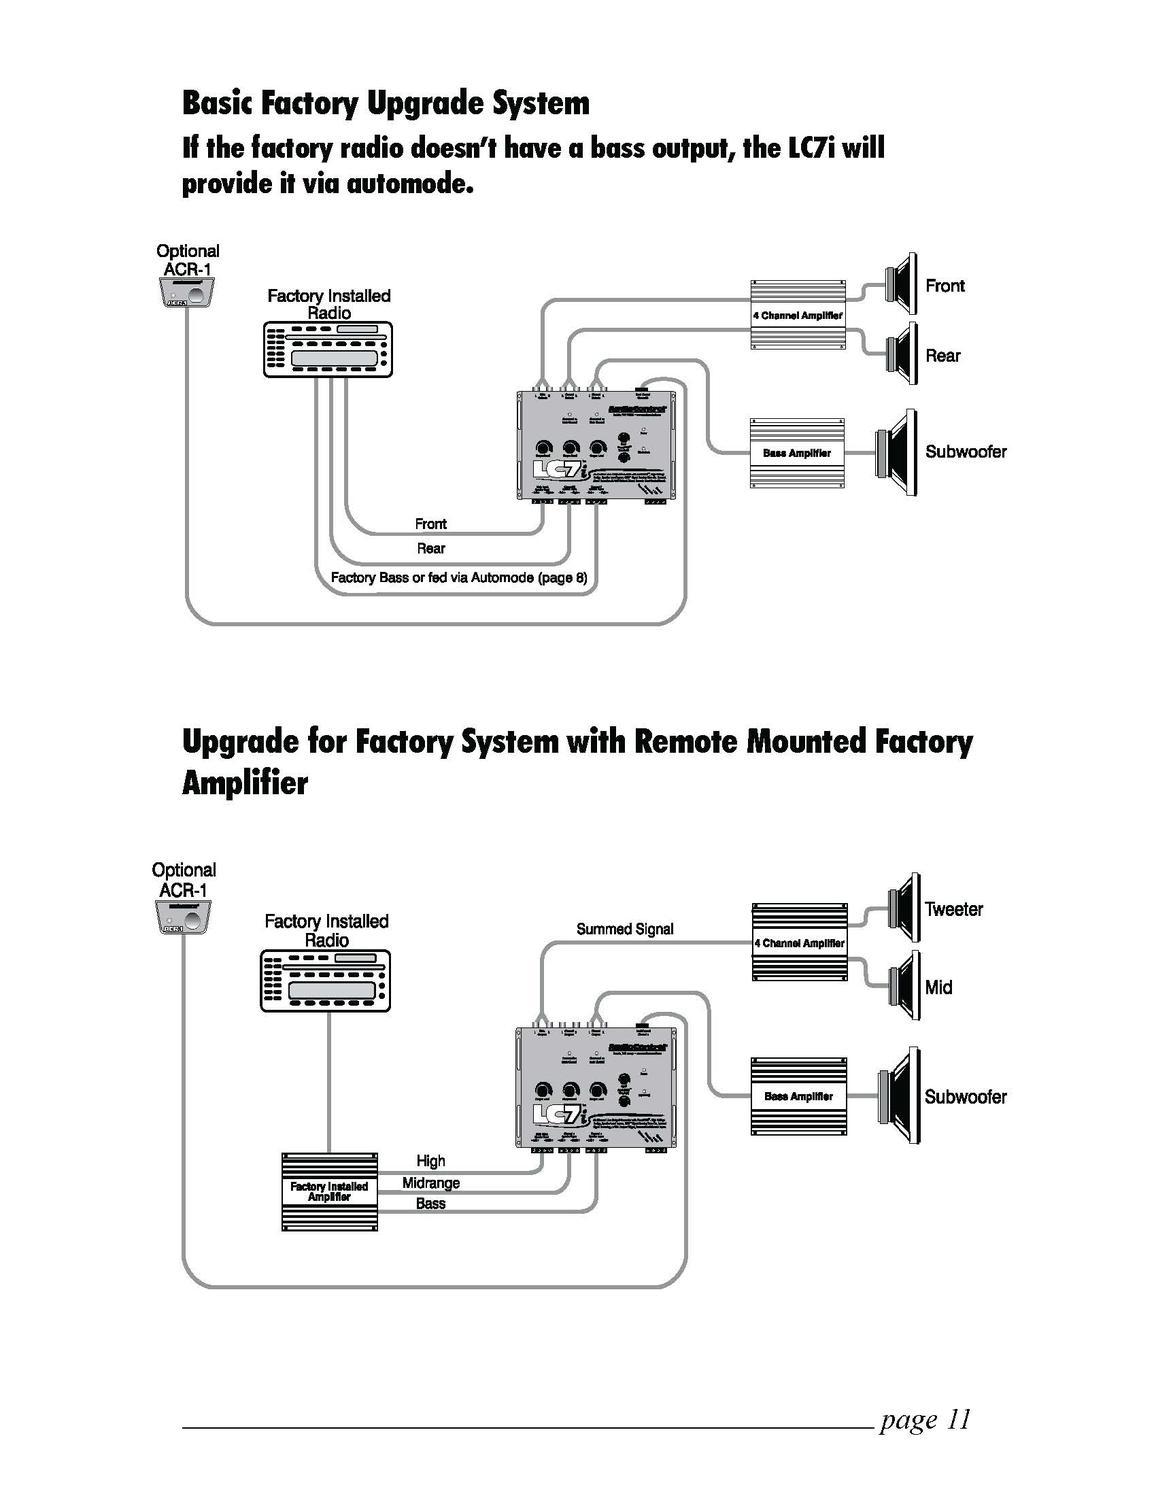 Fascinating Memphis Vs. Nashville Wiring Diagrams Ideas - Best Image ...